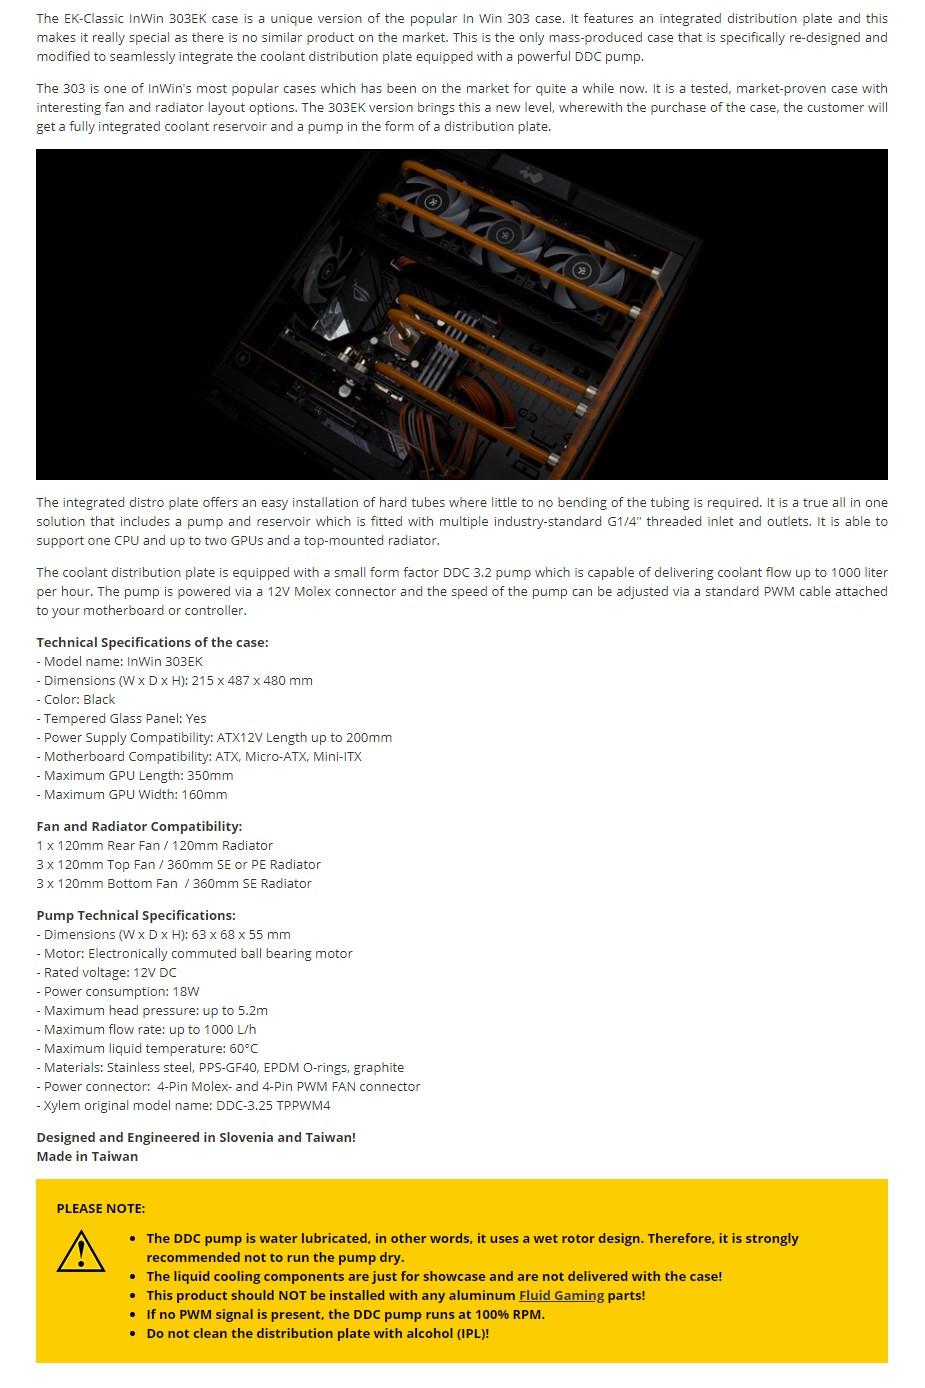 EKWB EK-Classic InWin 303EK ATX Mid-Tower Tempered Glass Case - Black - Overview 1